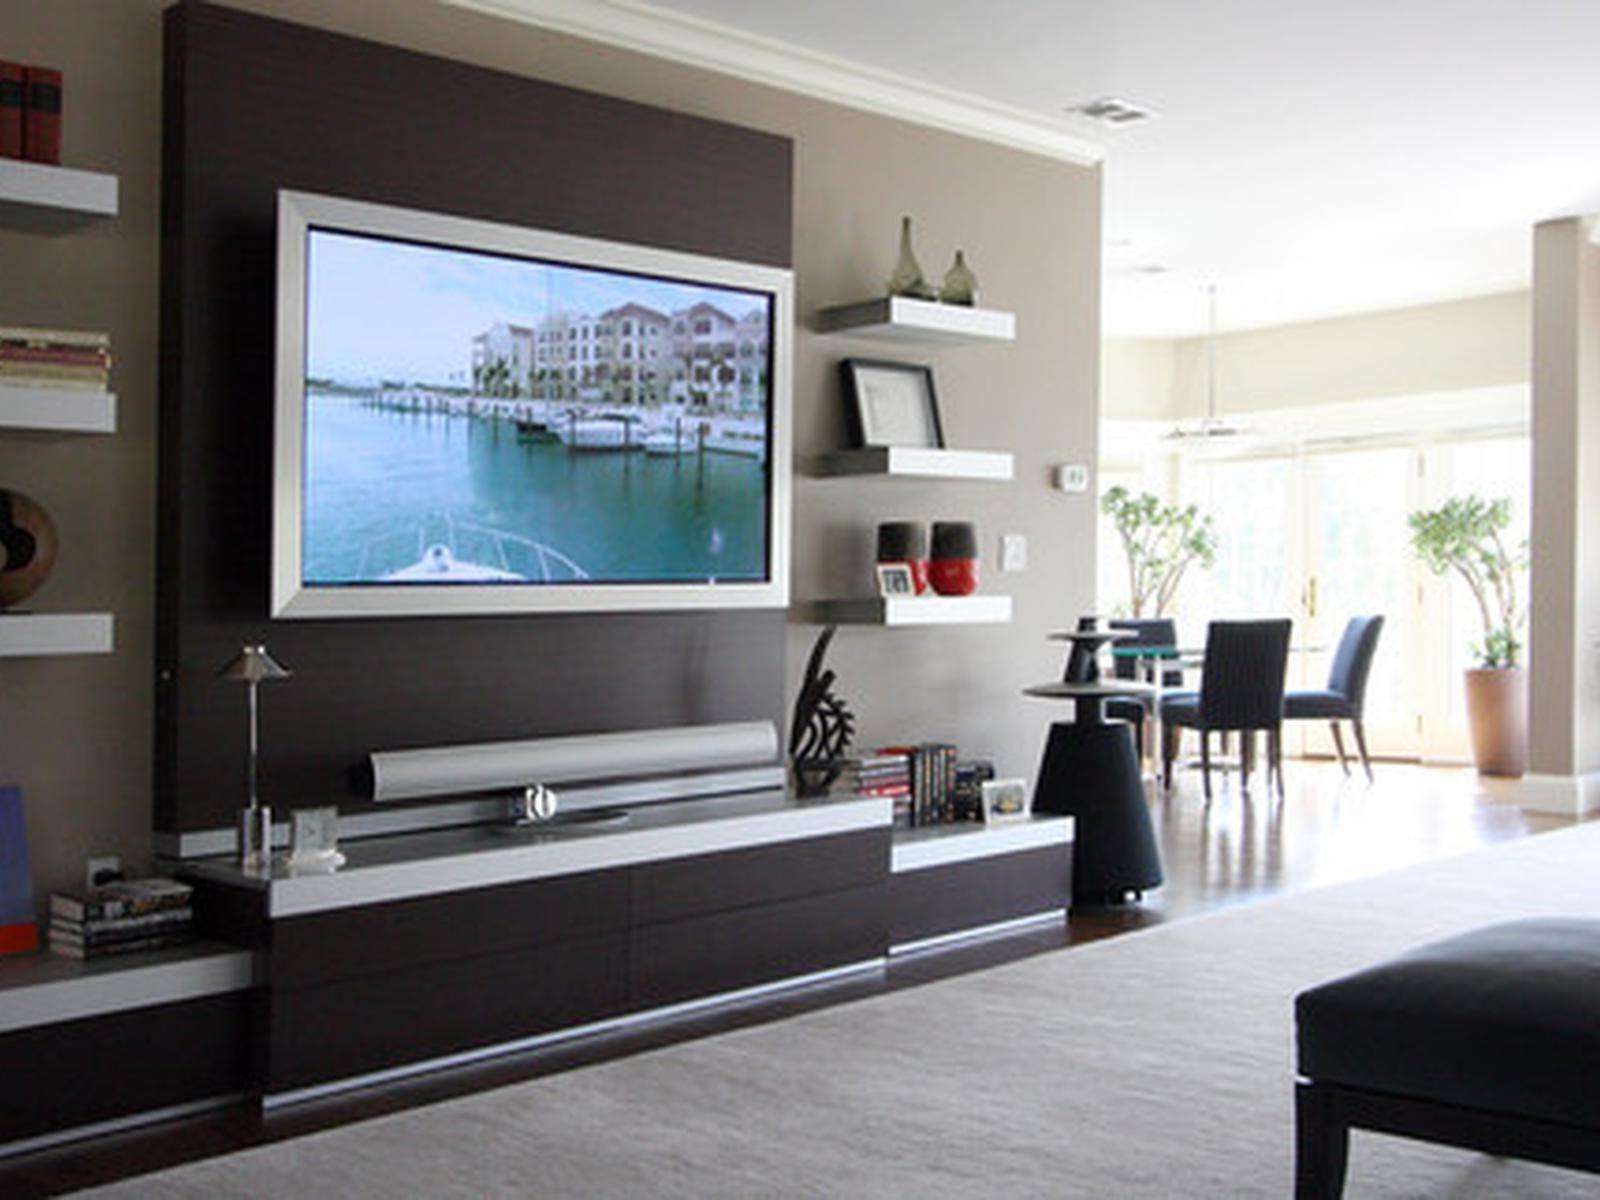 Top Hasil gambar untuk wall mounted tv cabinets for flat screens | ok  UU91